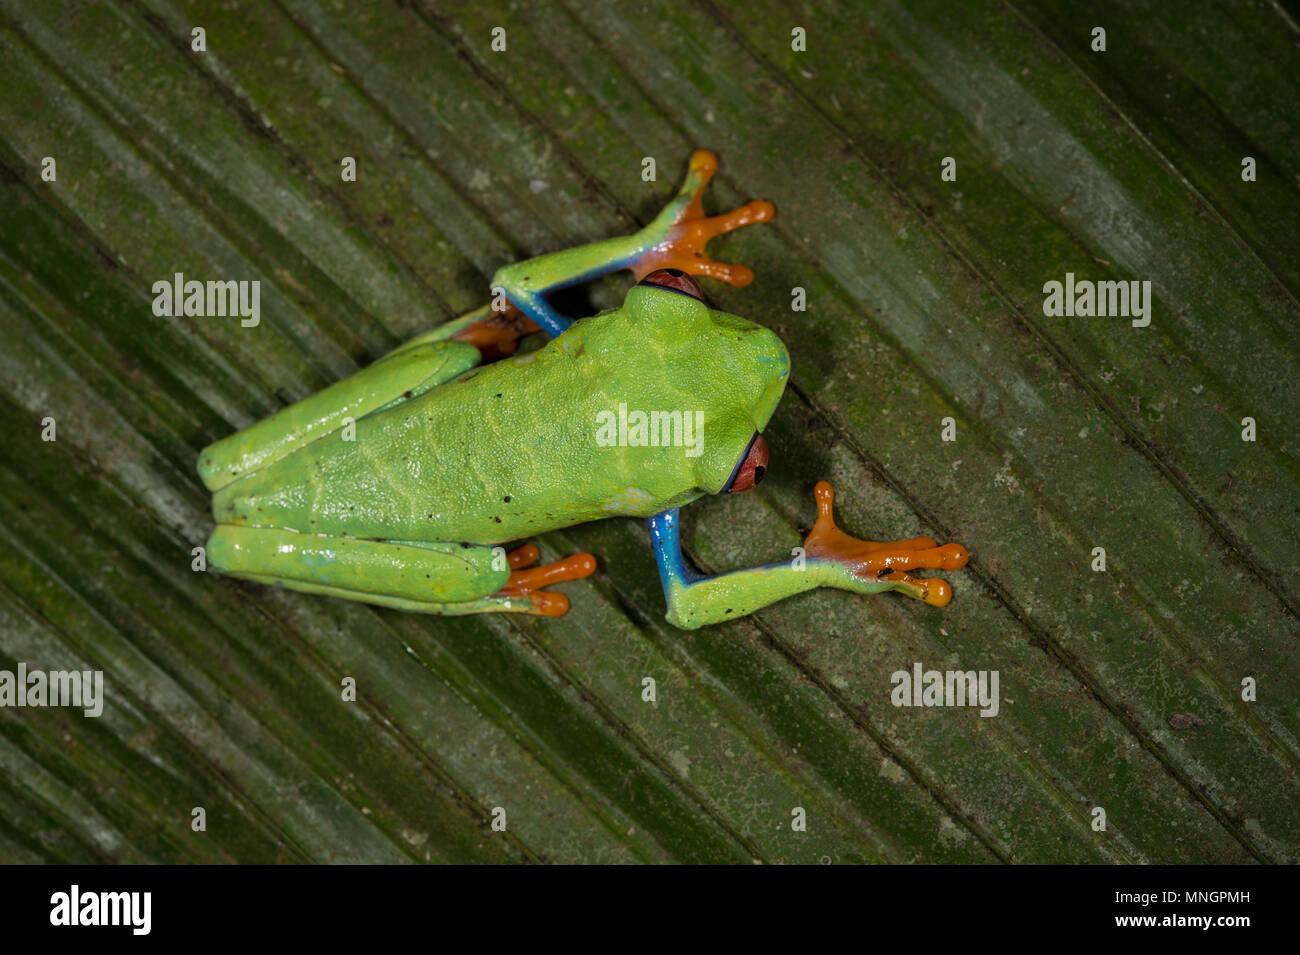 Red-eyed Leaf Frog, Agalychnis callidryas, Hylidae, Manuel Antonio National Park, Costa Rica, Centroamerica Stock Photo